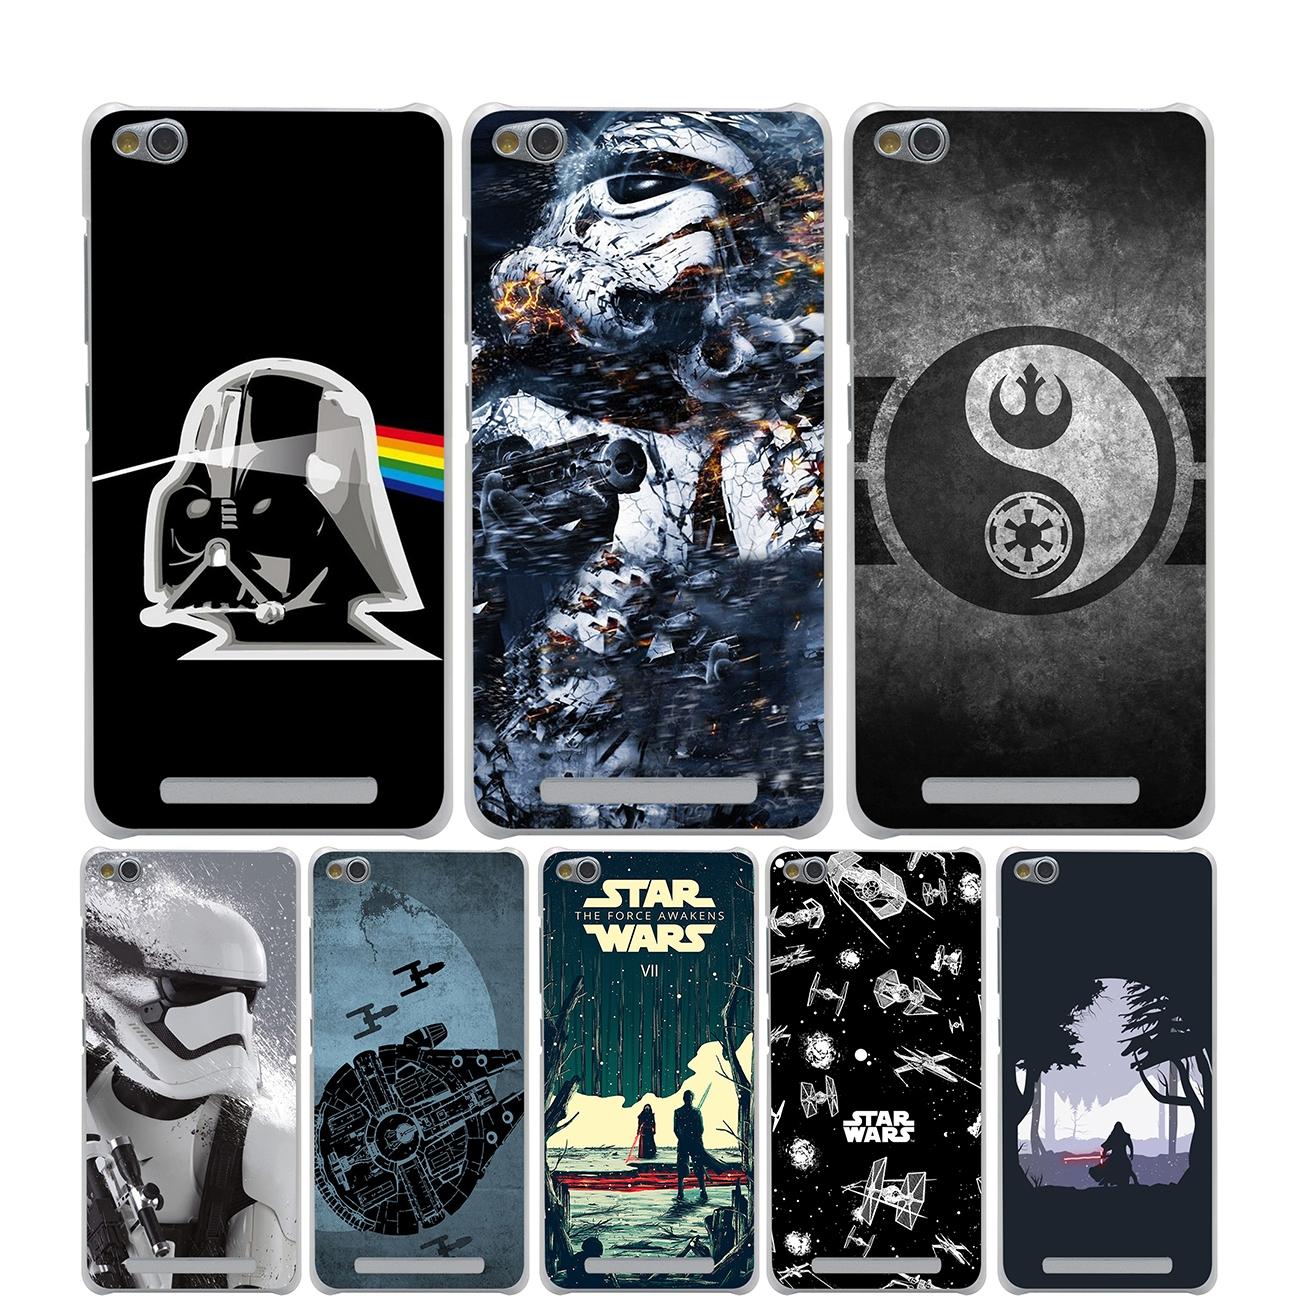 Star Wars Phone Cover Case For Xiaomi Redmi Note 2 3 4 Pro Prime 4a 4x